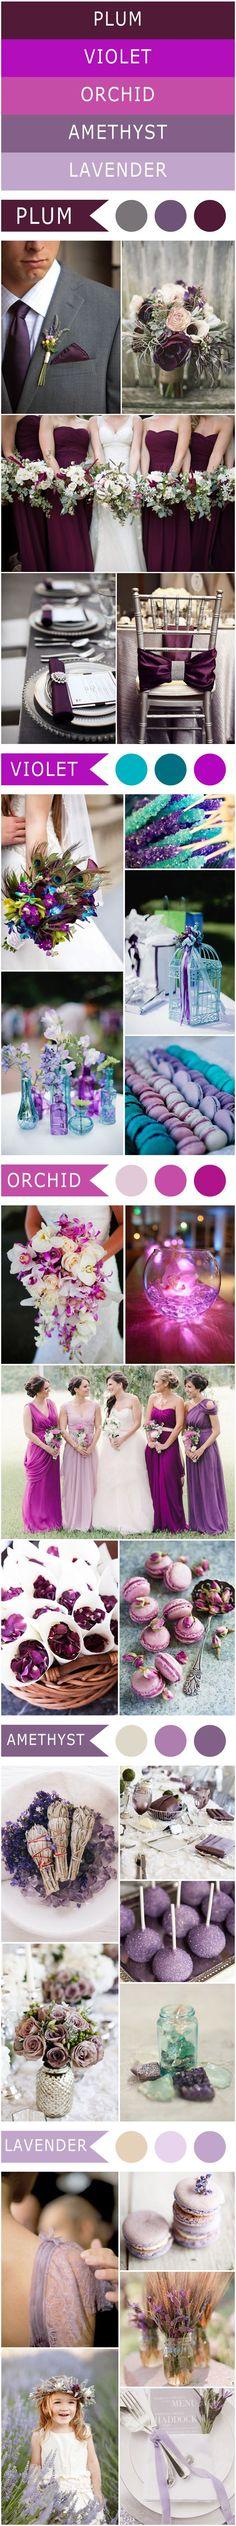 Amethyst -                                                      Different Shades of Purple Wedding Color Ideas-Plum, Violet, Orchid, Amethyst, Lavender